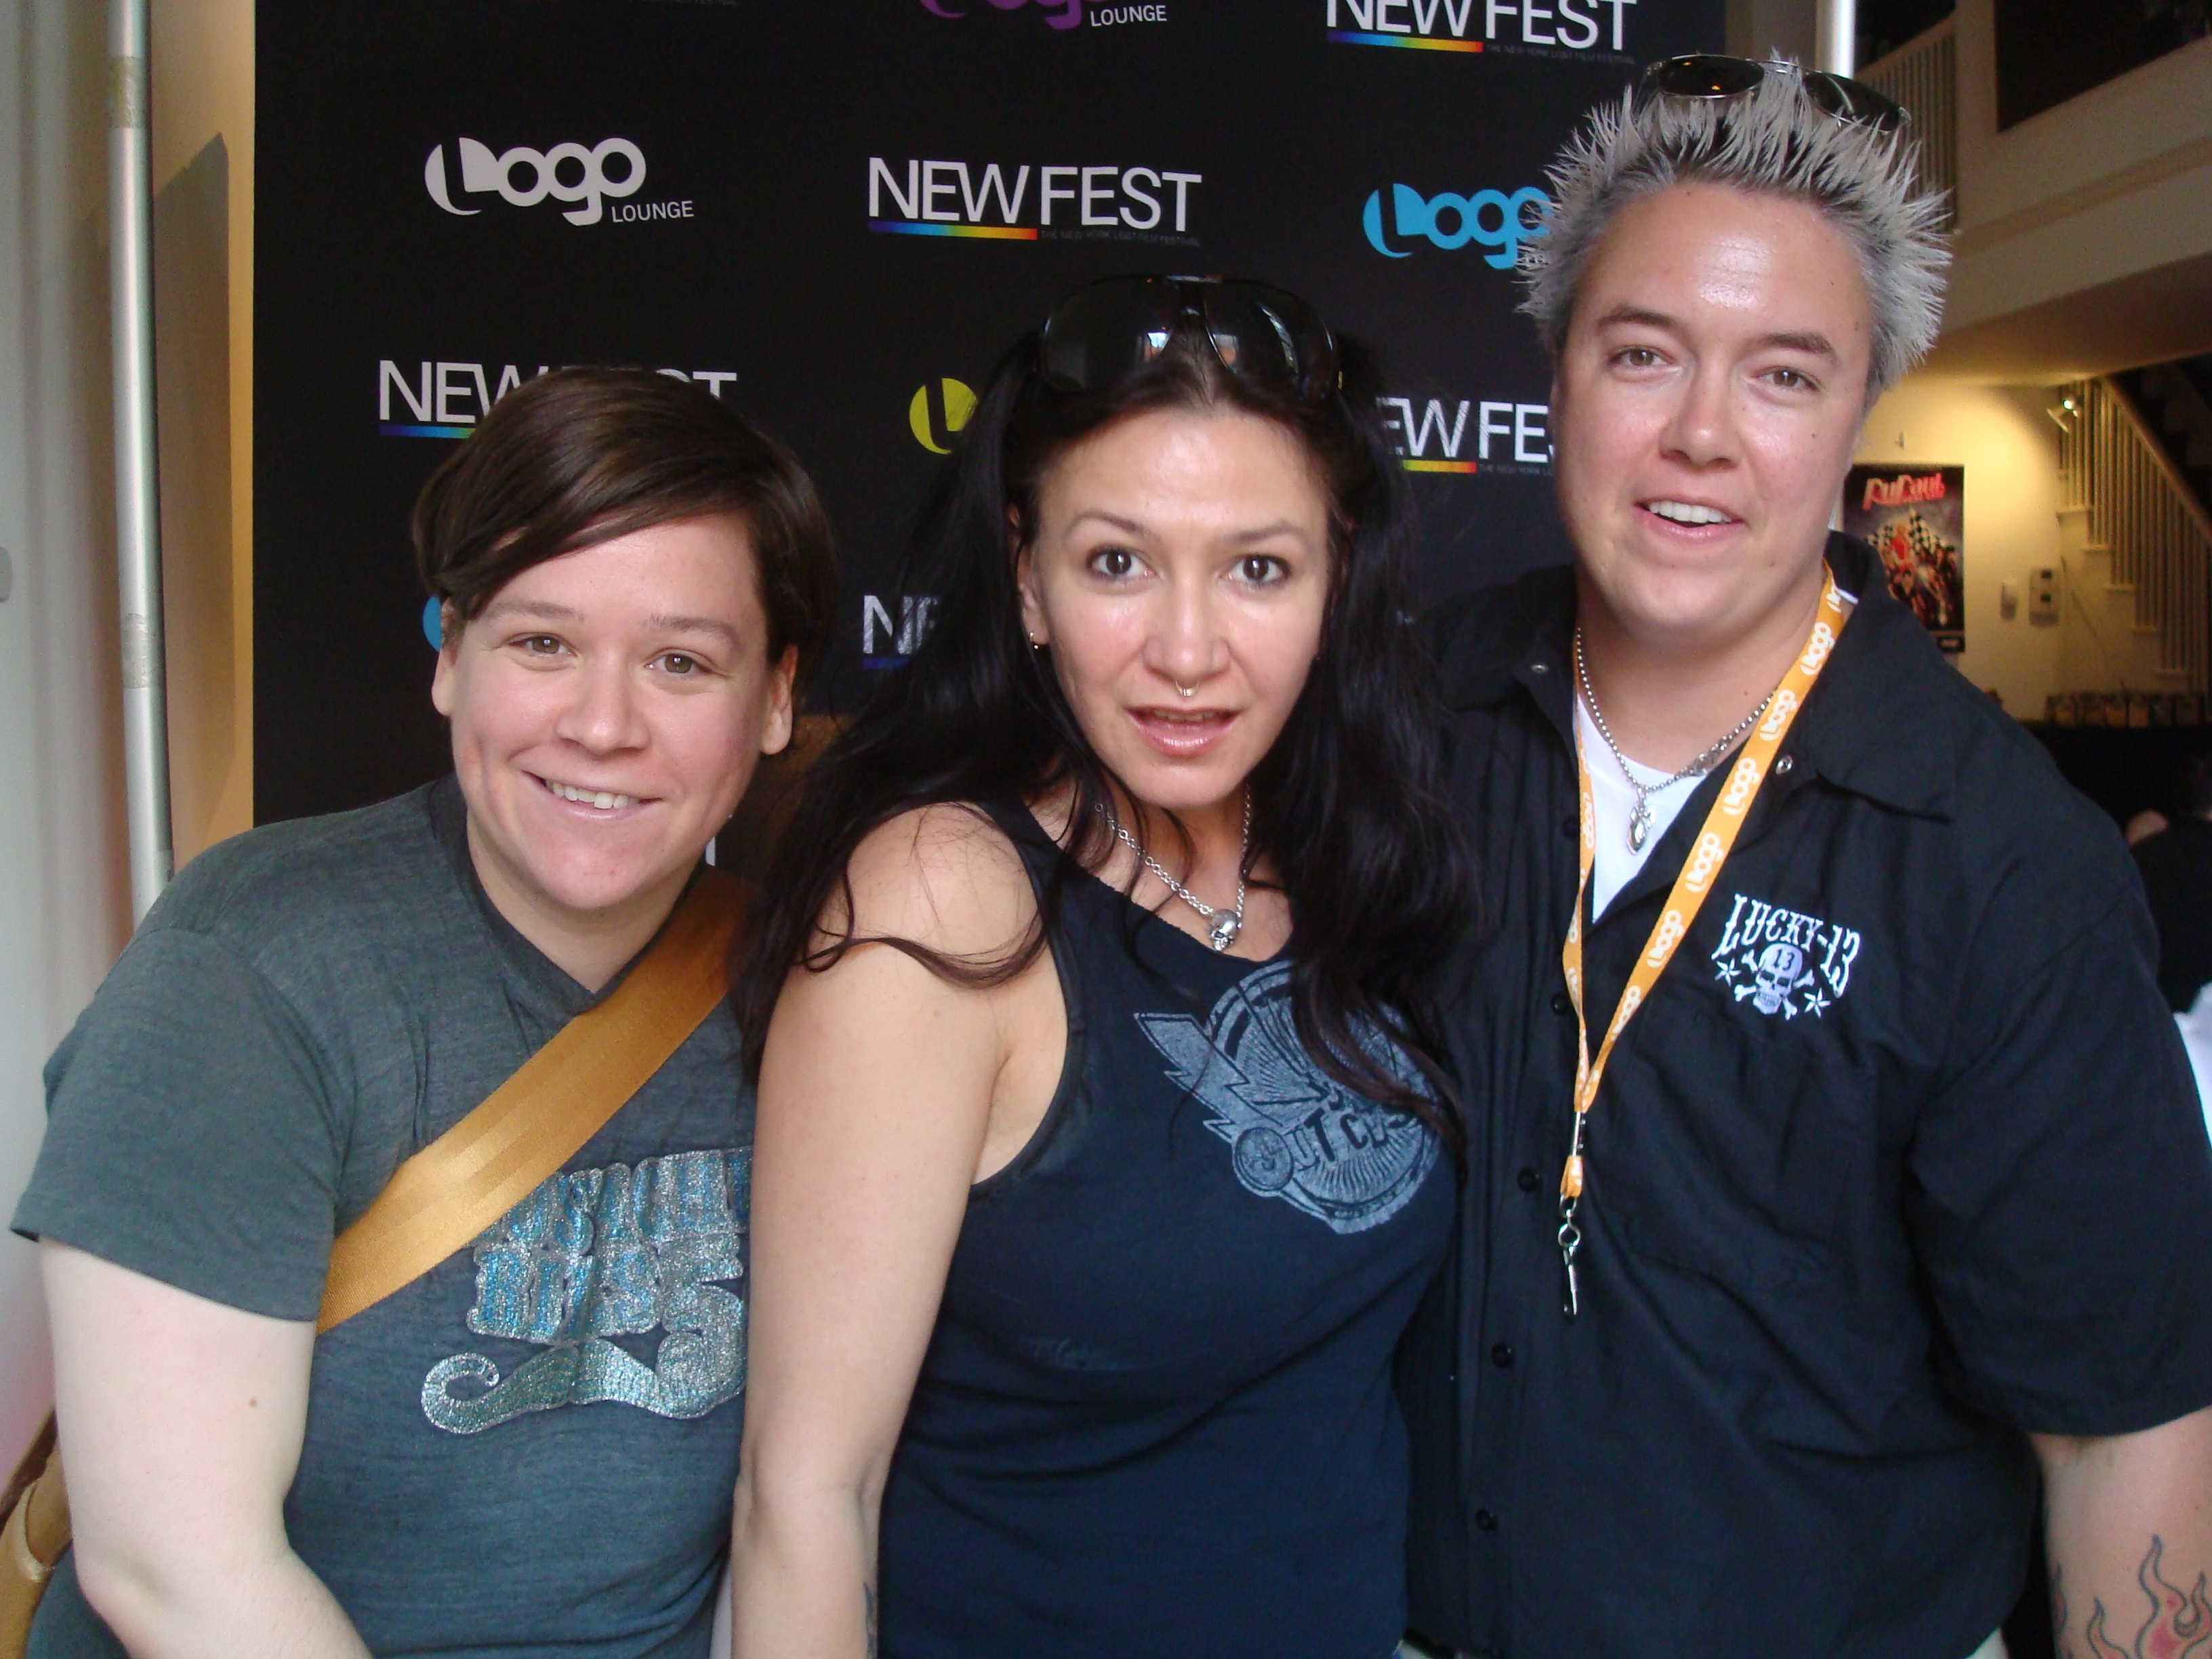 Ali Cotterill, Katrina del Mar & Kenny Hillman at NewFest '09 photo by Sarah Greenwood